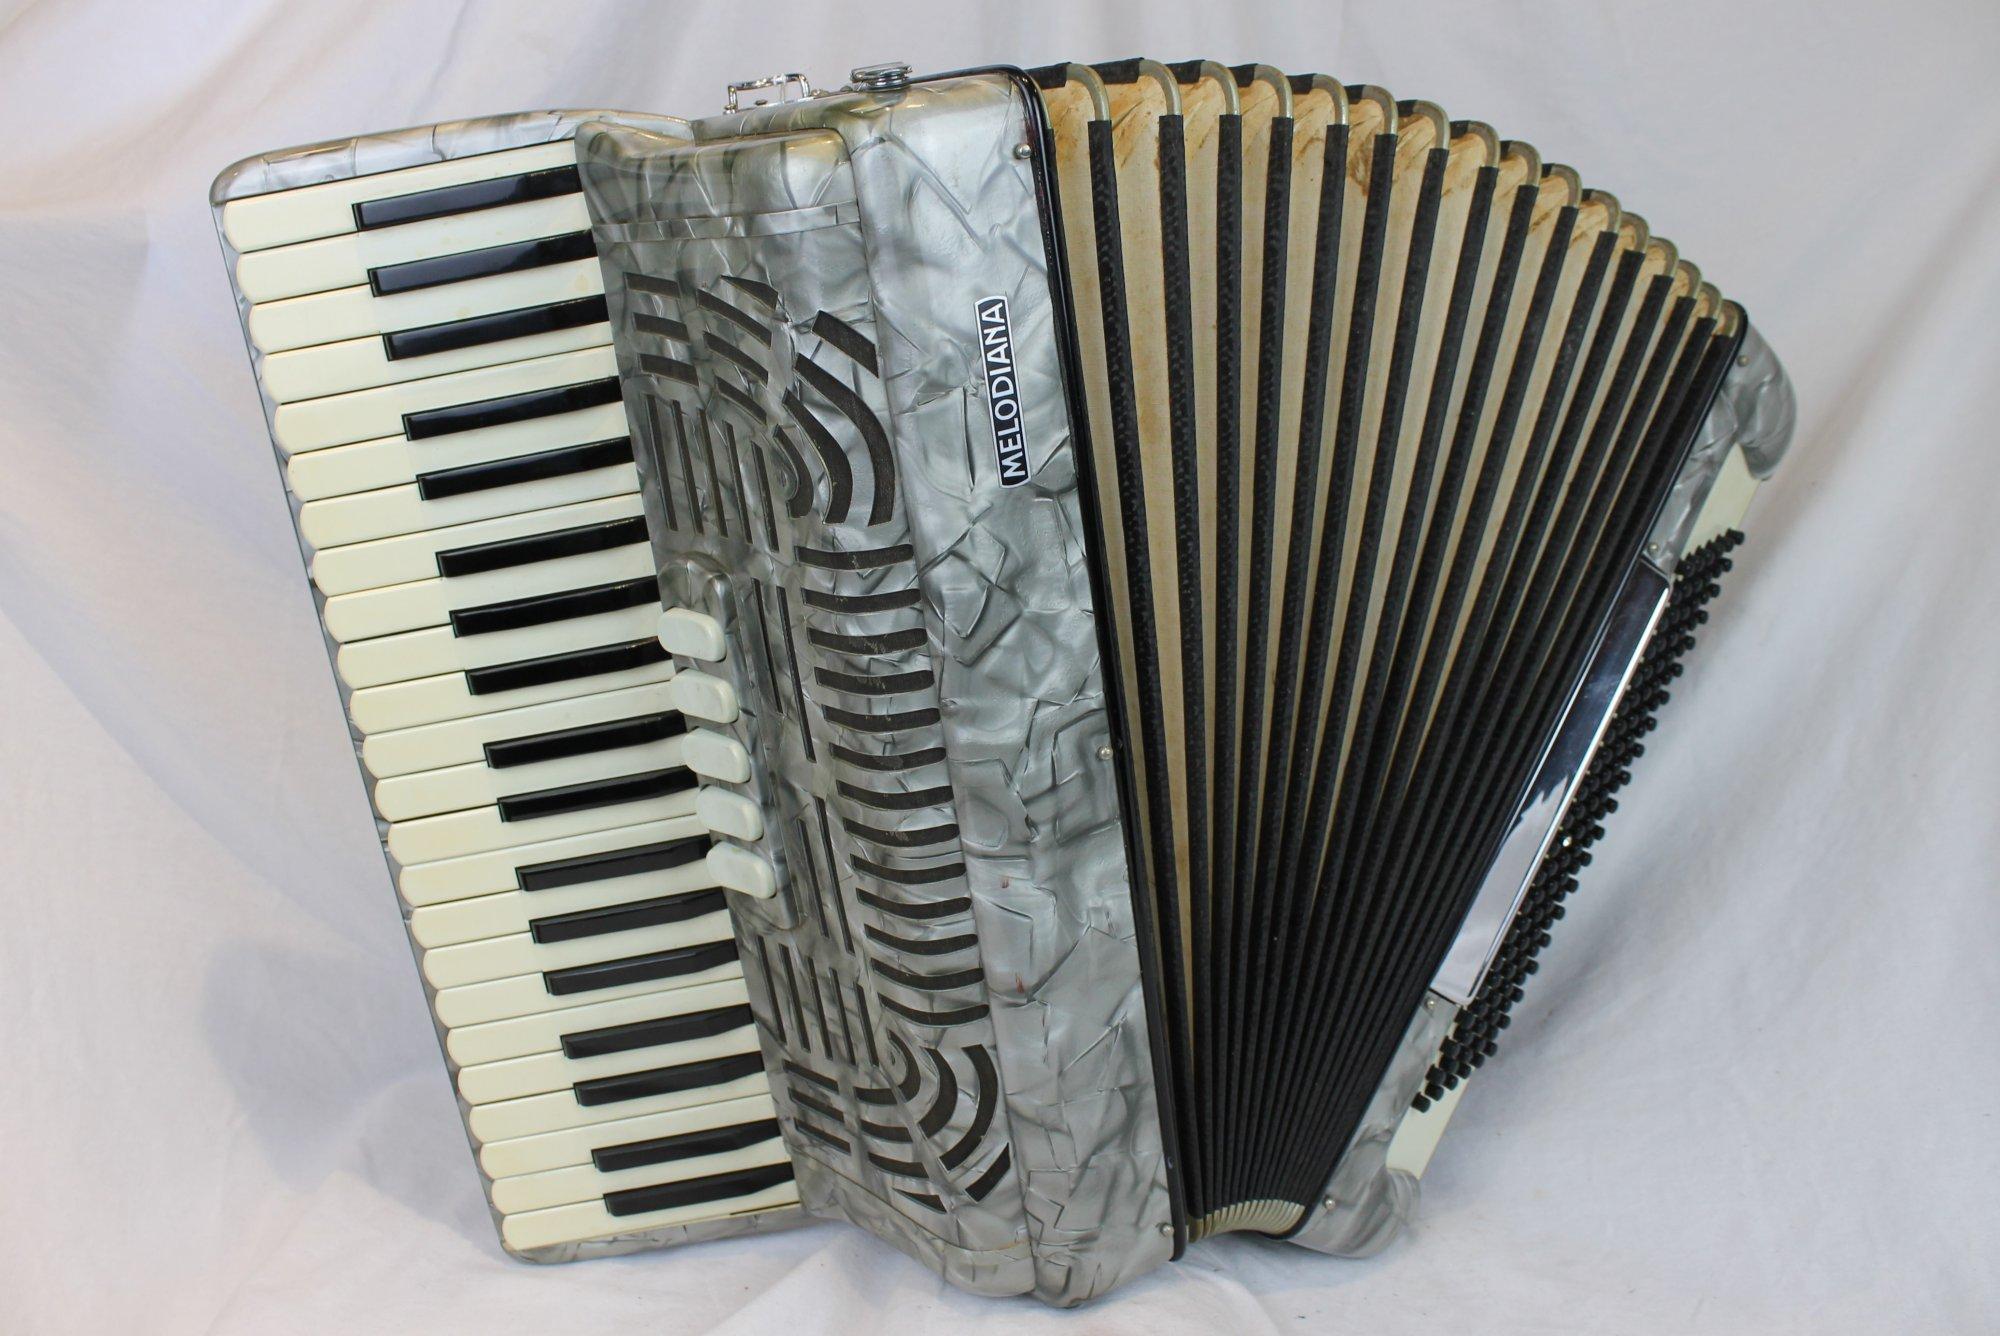 4224 - Silver Melodiana Piano Accordion LMM 41 120